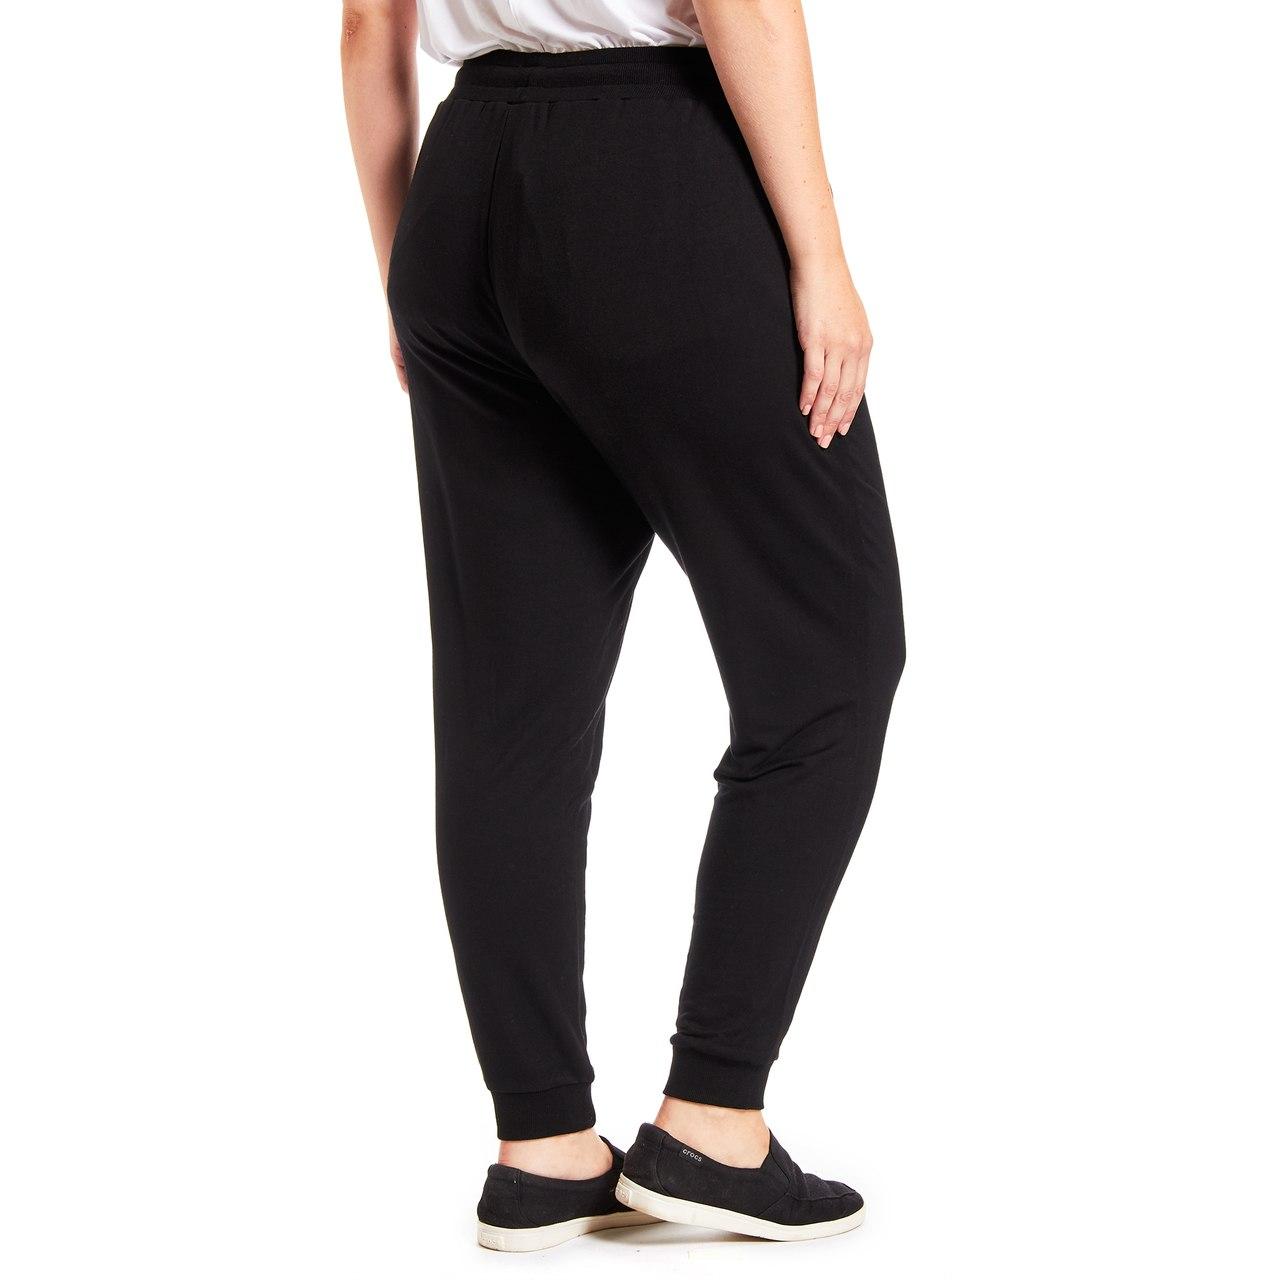 Curvy Drawstring Jogger Pant In Black